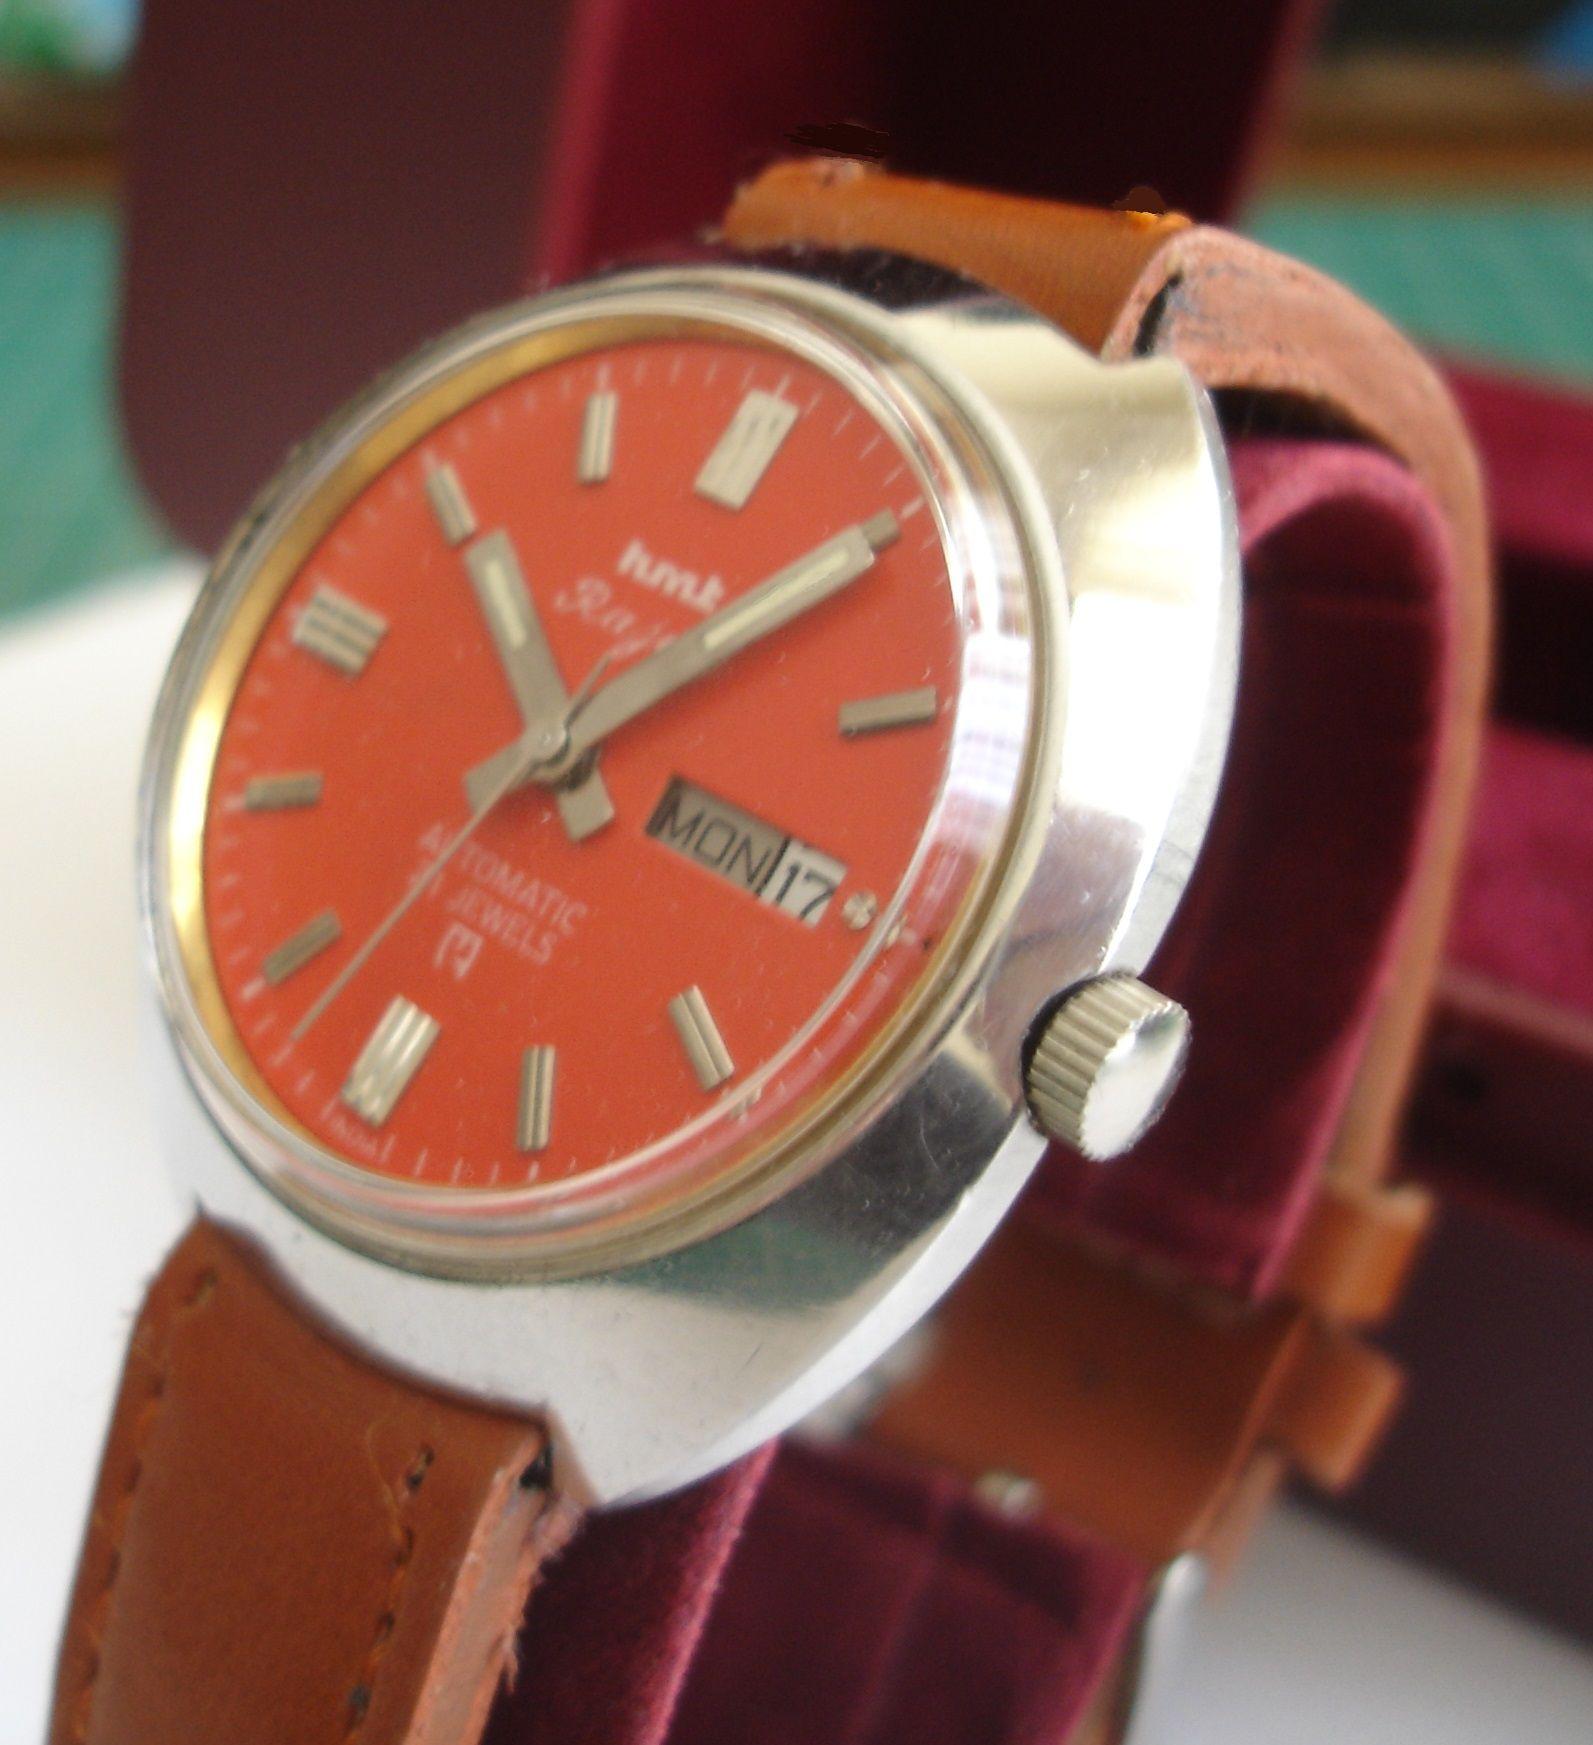 Hmt Rajat 21 Jewel Automatic Mens Wristwatch Red Pink Dial Etsy Wristwatch Men Jewels Tan Leather Strap